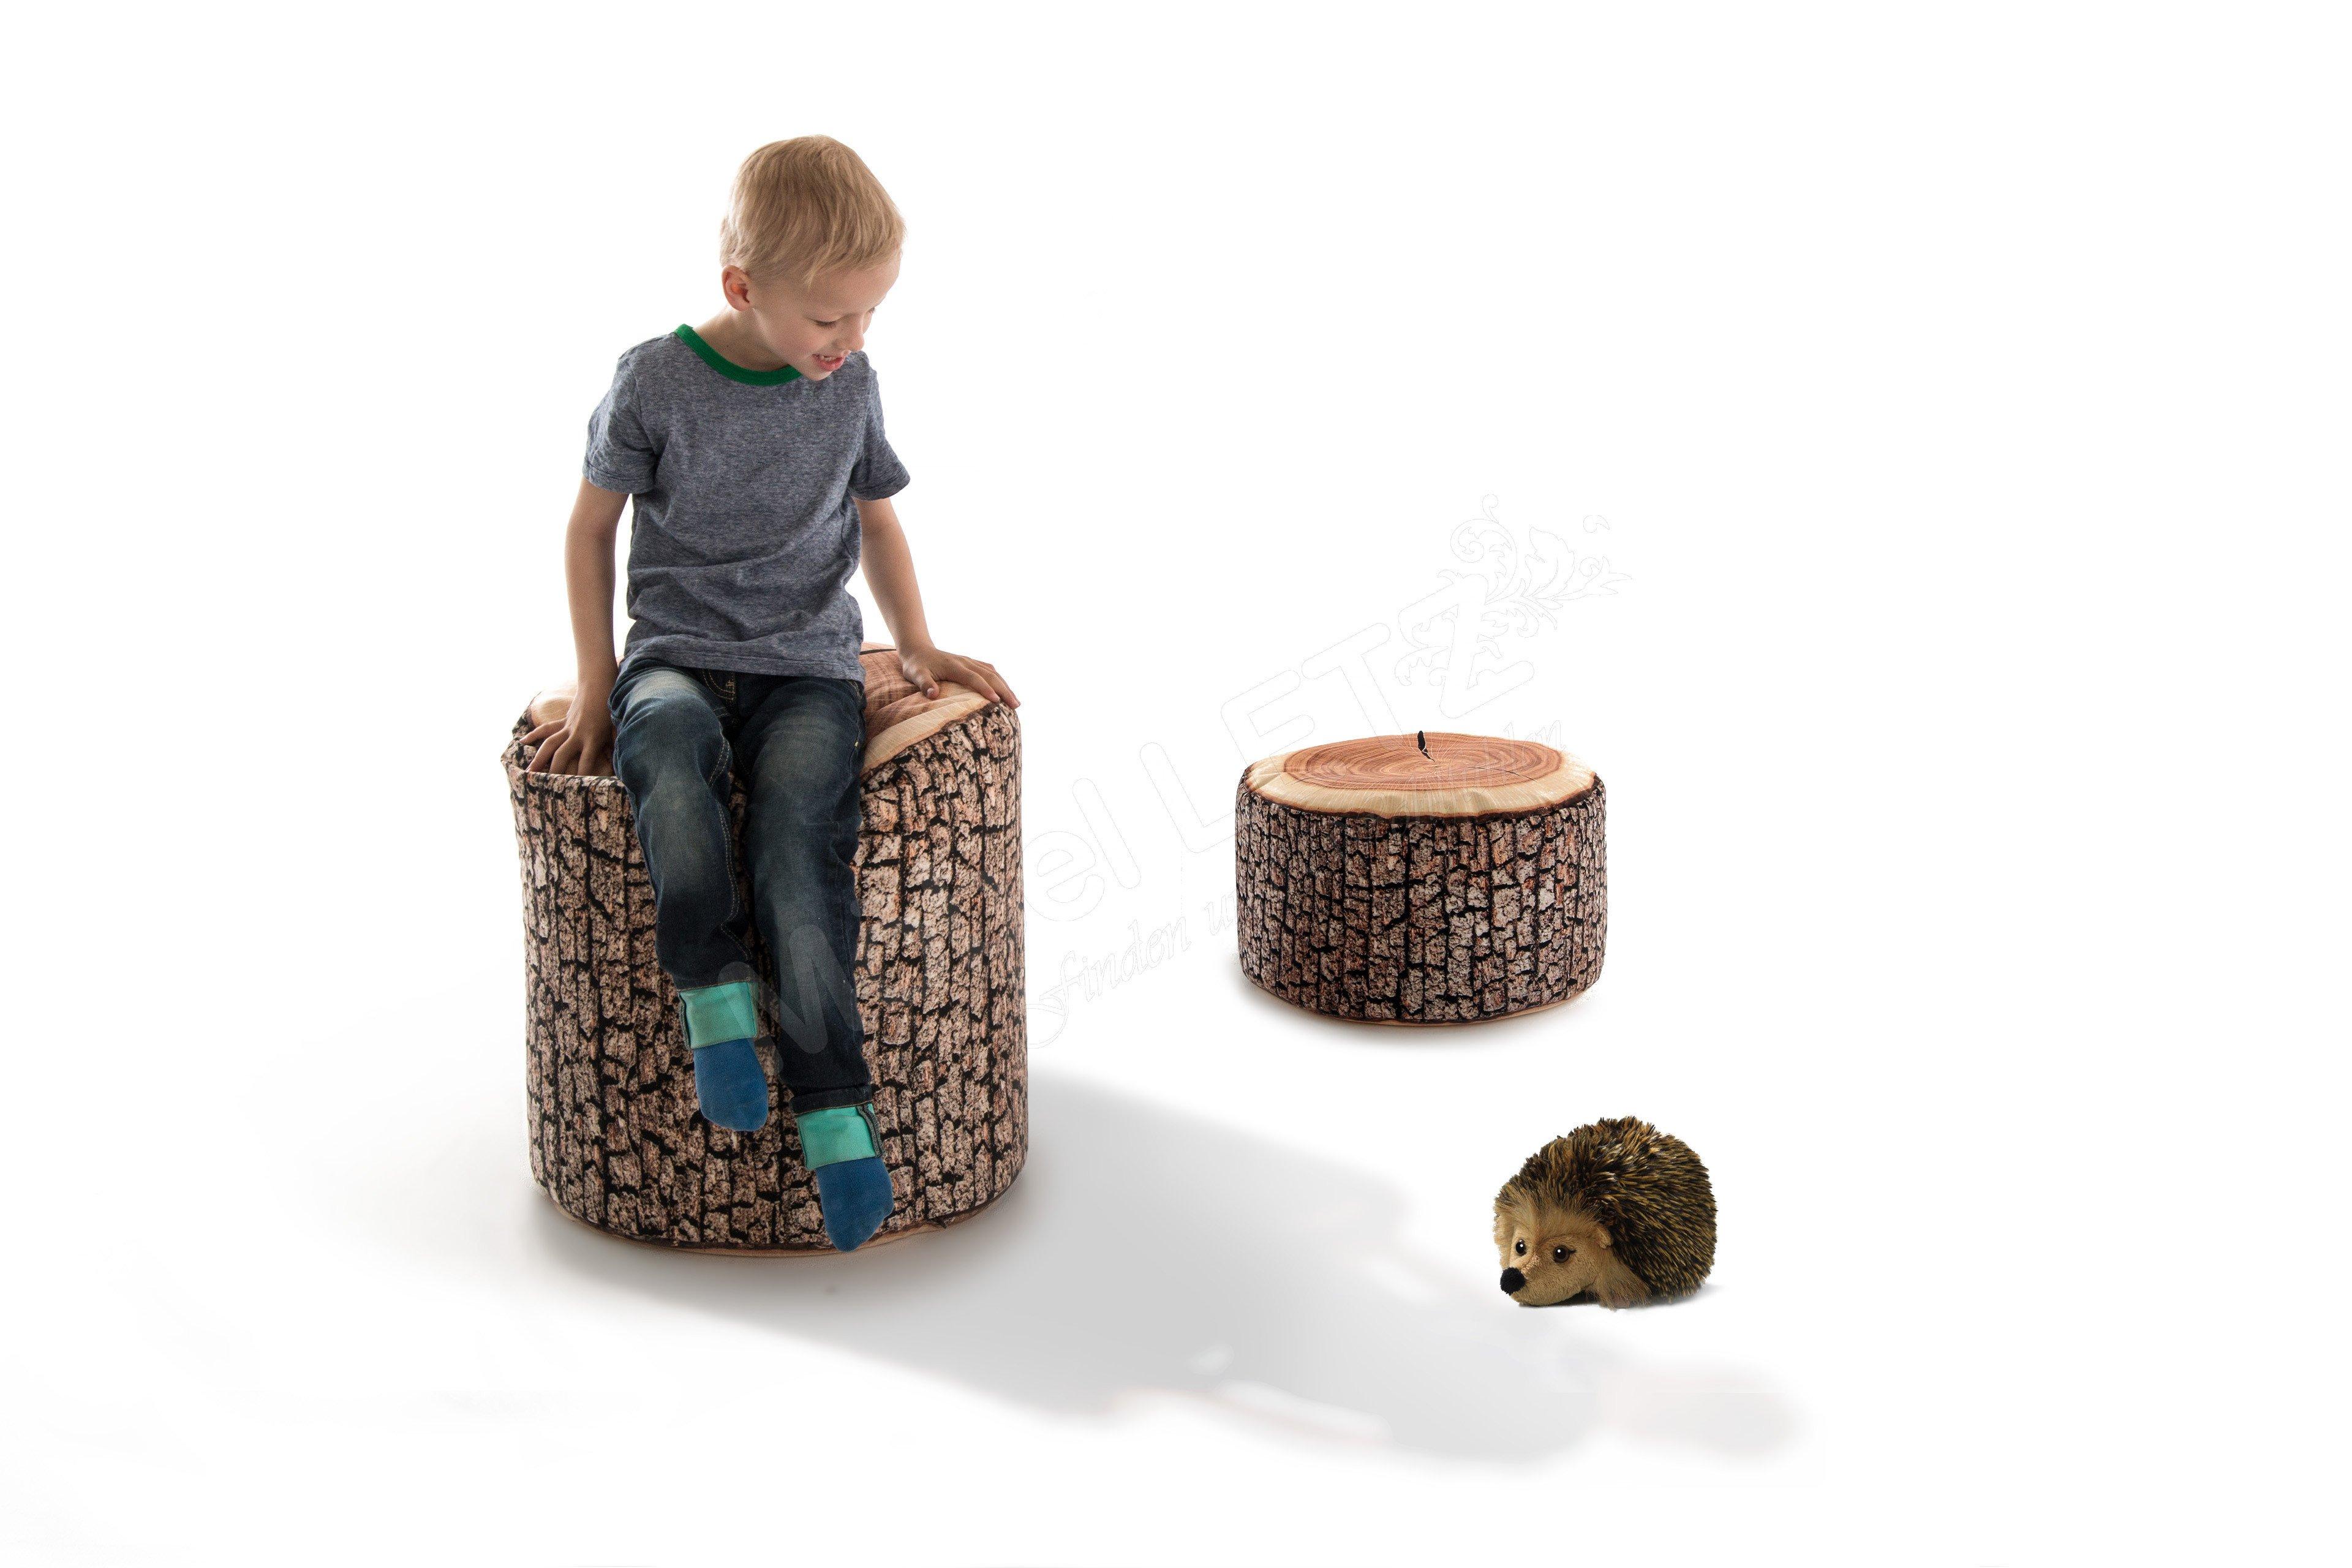 sitzsack dotcom wood von magma heimtex h he ca 50 cm m bel letz ihr online shop. Black Bedroom Furniture Sets. Home Design Ideas